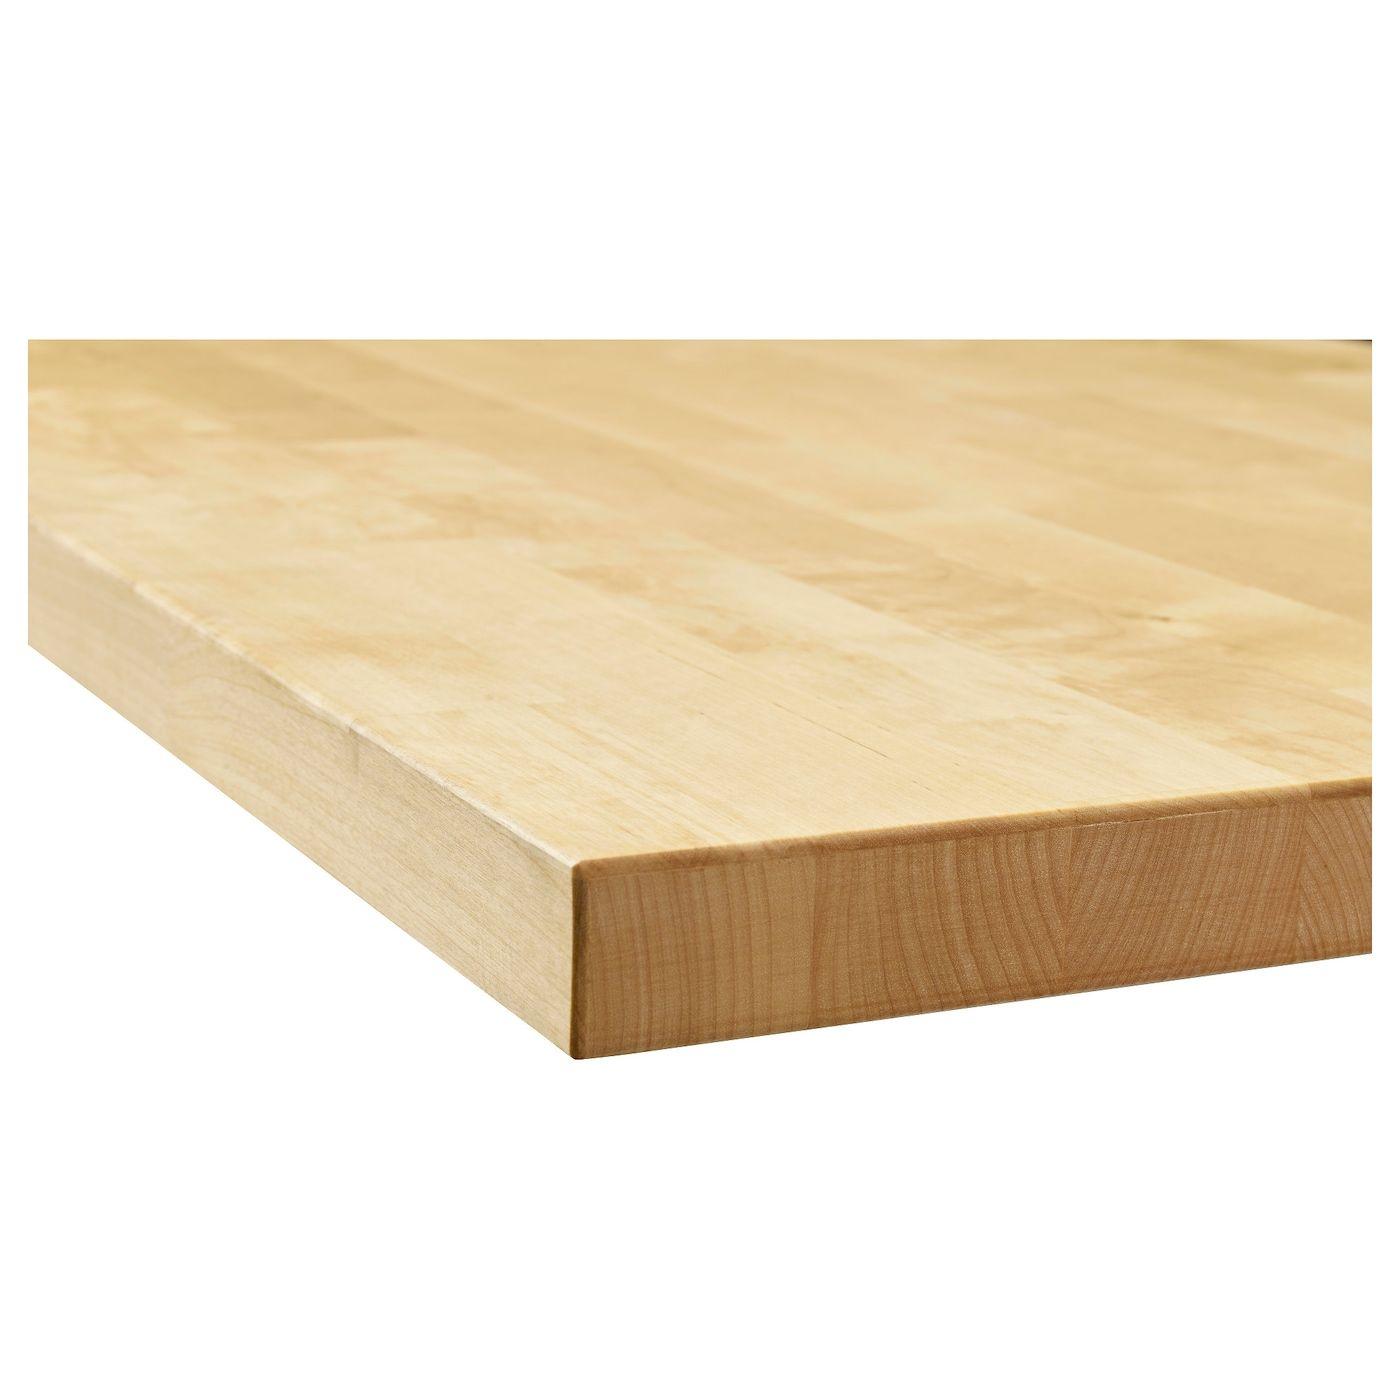 Karlby Countertop Birch Veneer 74x1 1 2 Arbeitsplatte Massivholz Arbeitsplatte Ikea Produkte